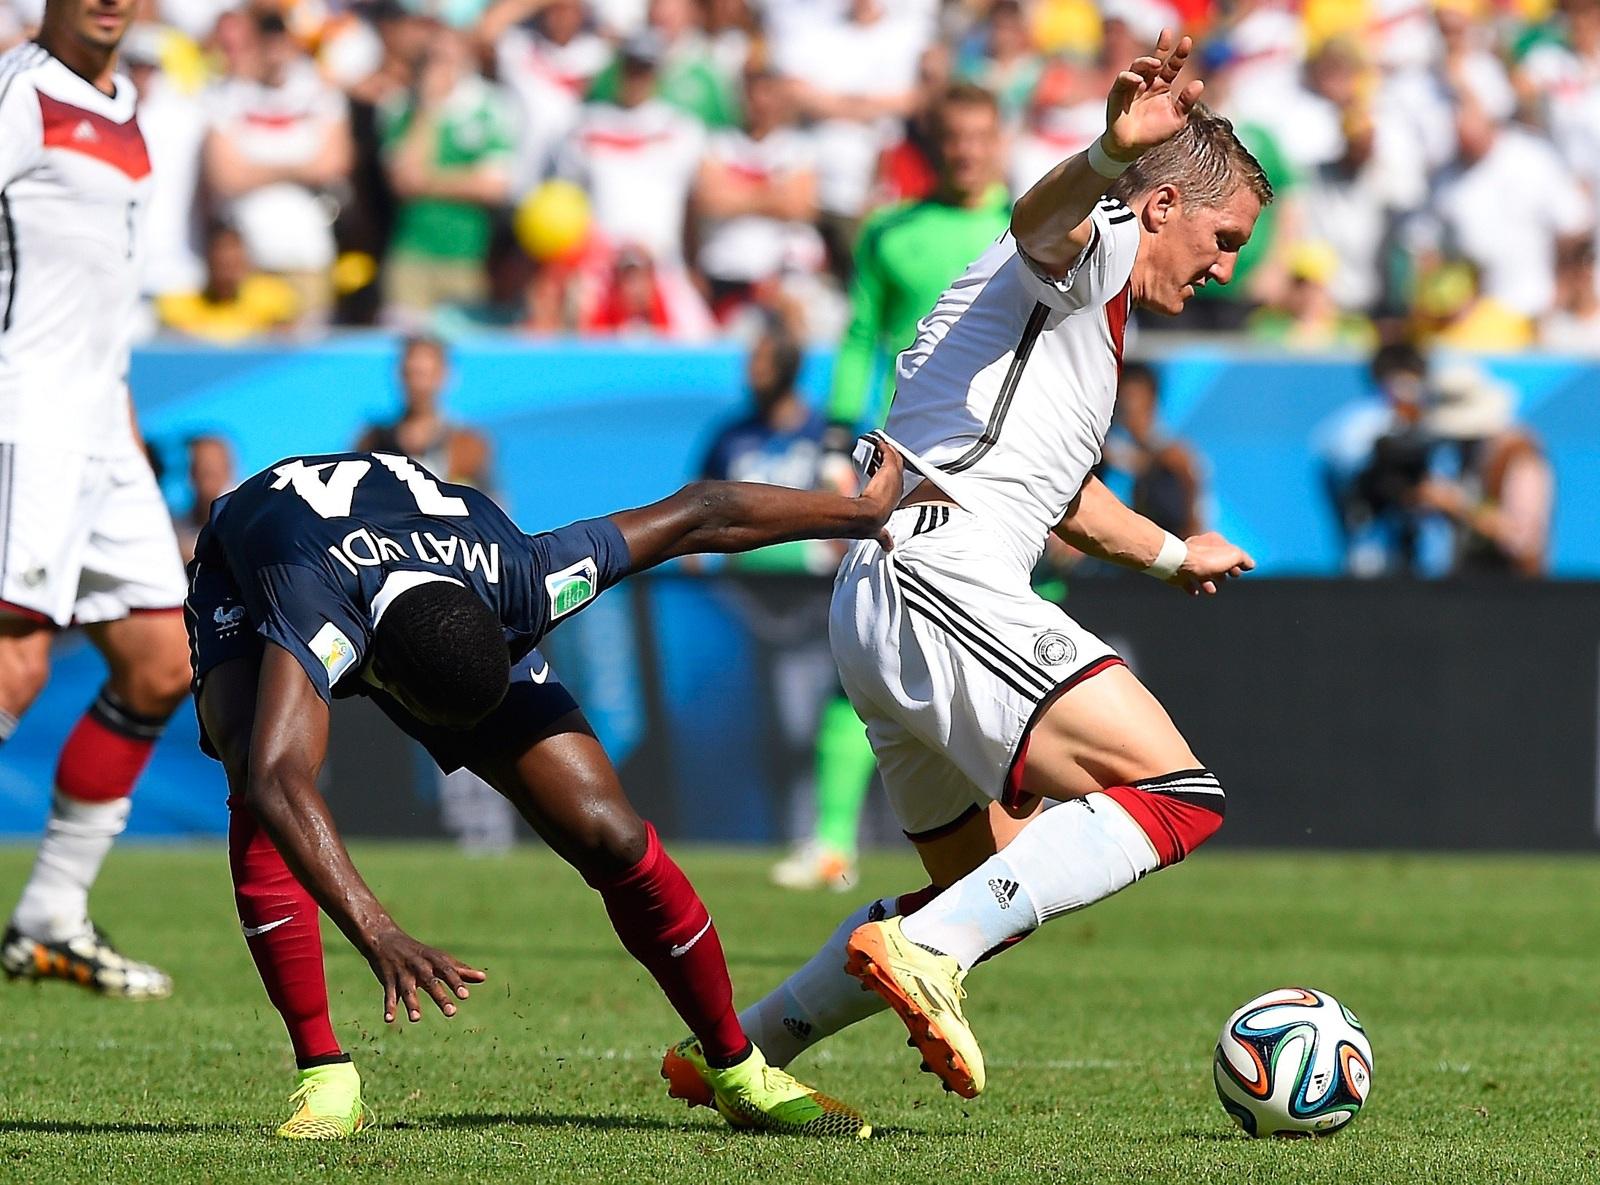 Gegner Deutschland Halbfinale